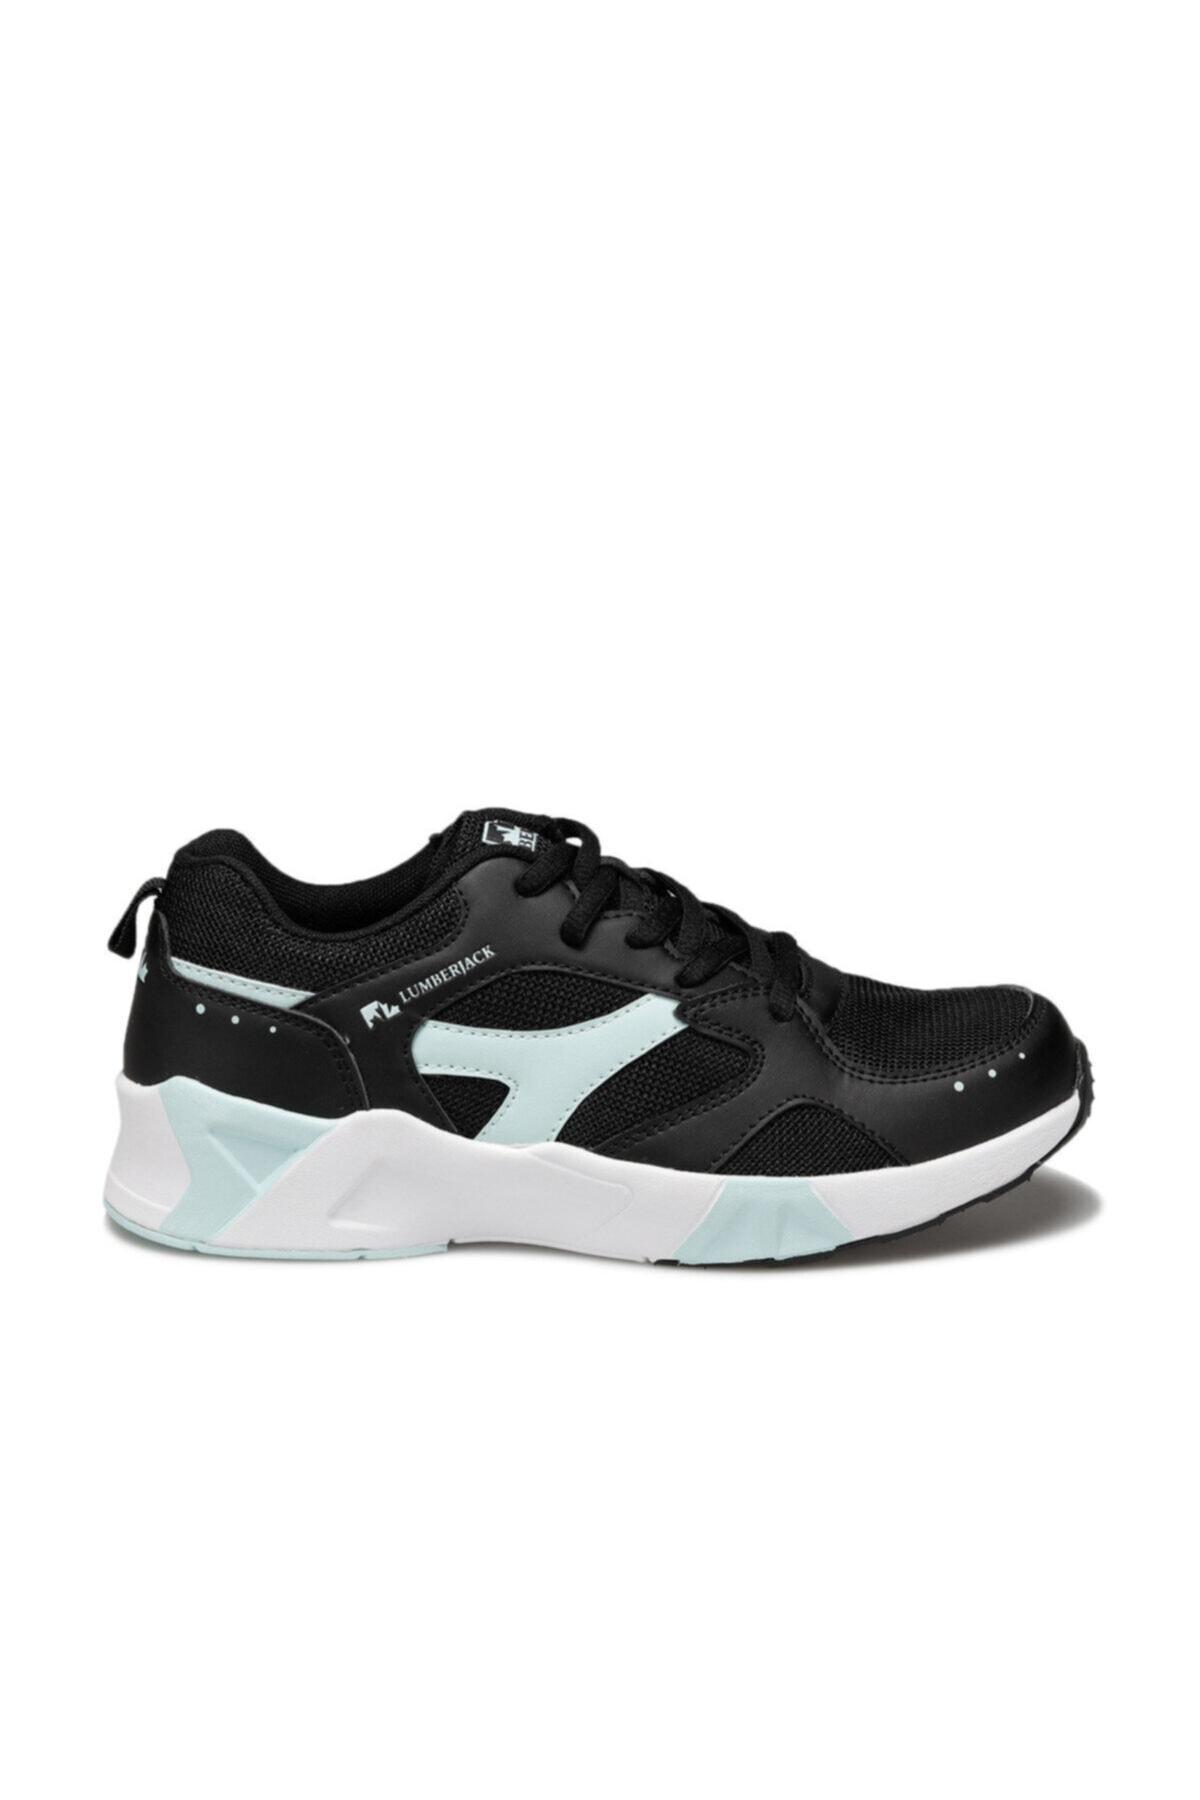 lumberjack Blossom Siyah Kadın Sneaker Ayakkabı 2